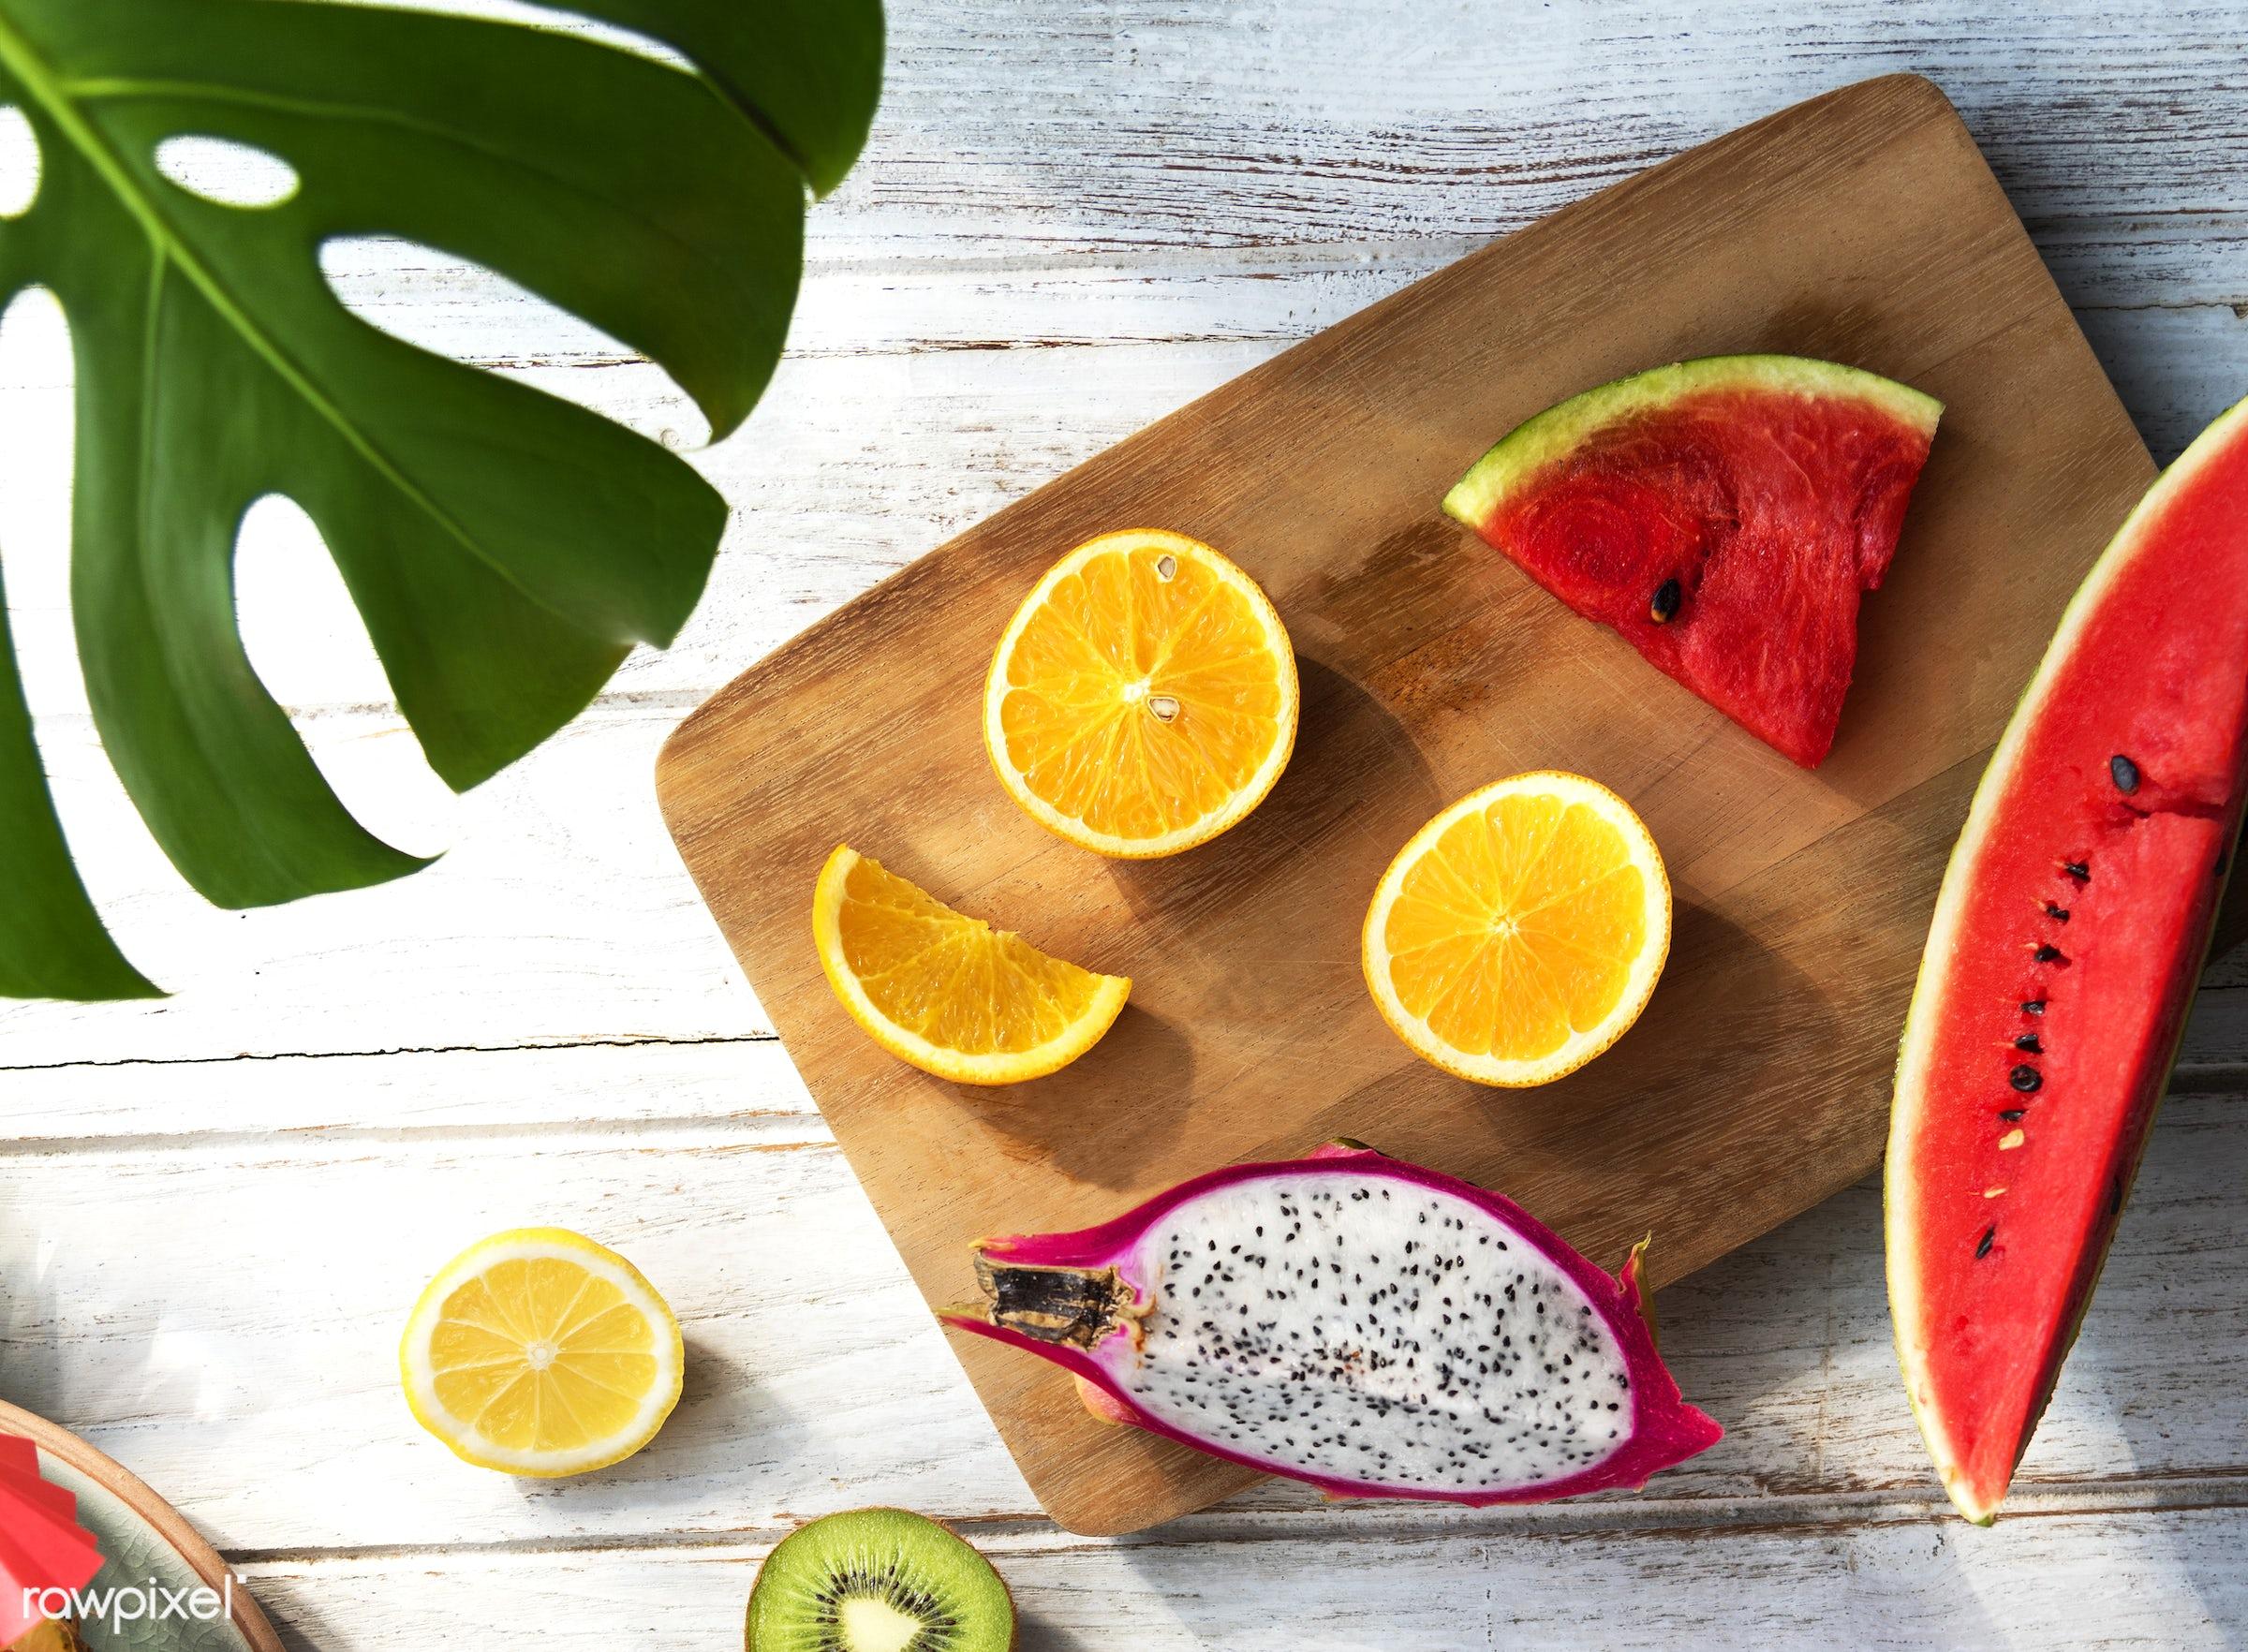 juice, tropical, nature, vegetarian, aerial, break, citrus, fresh, freshness, fruits, healthy, holiday, nobody, organic, raw...